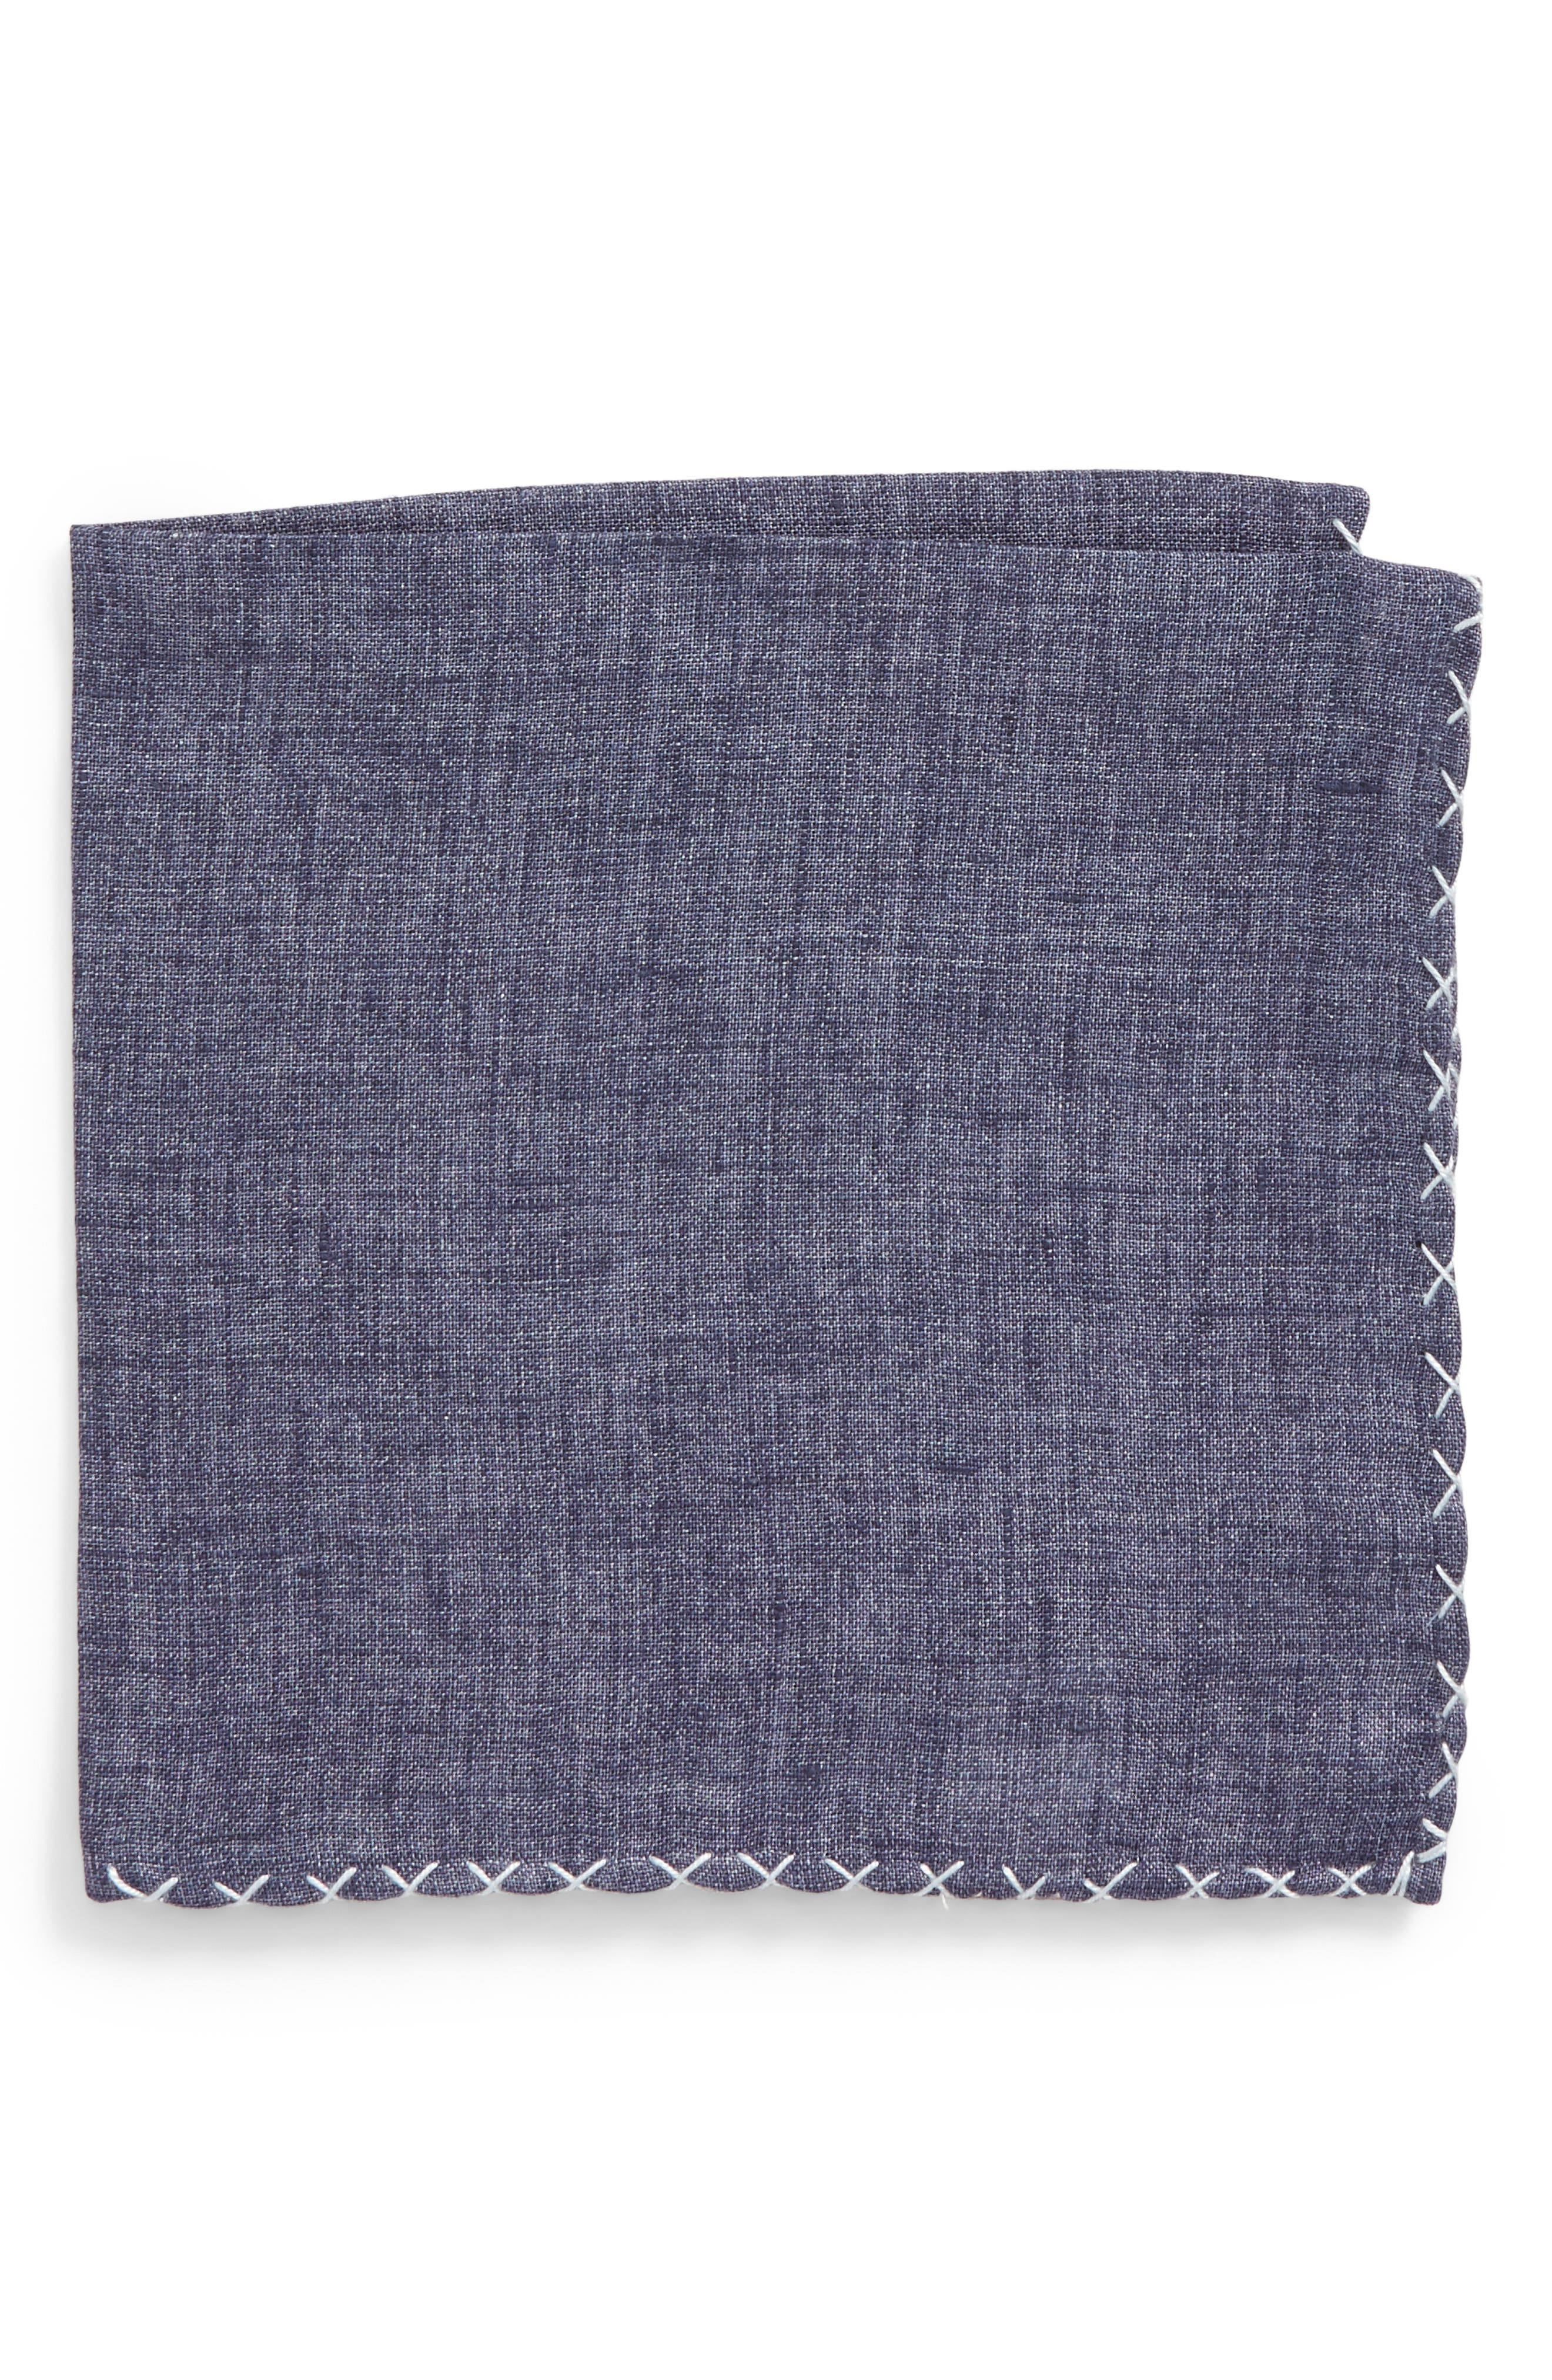 Solid Linen Pocket Square,                             Main thumbnail 1, color,                             020